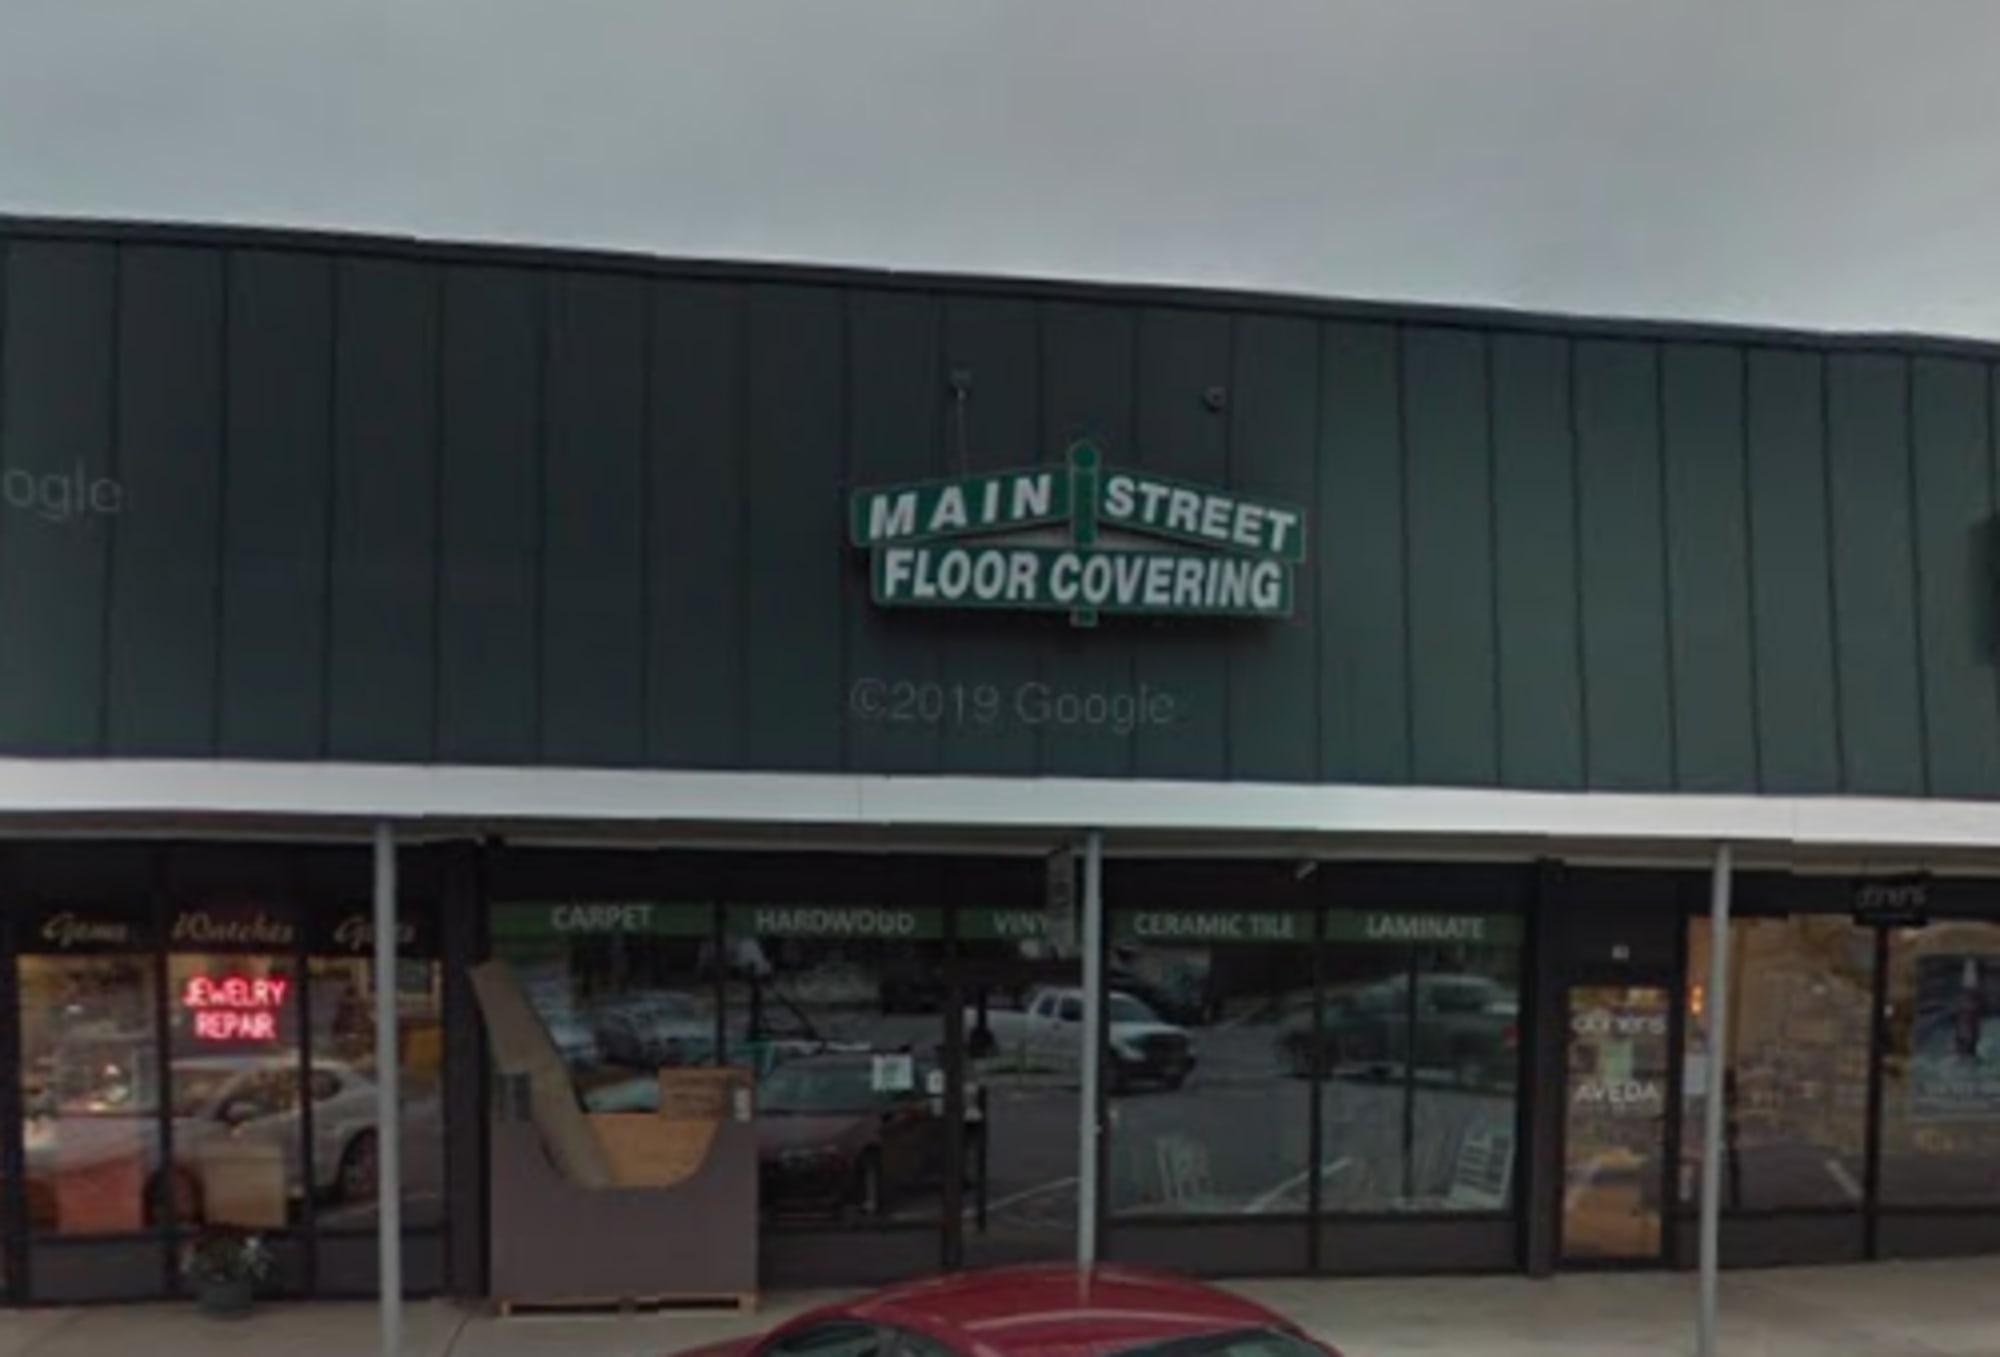 Main Street Floor Covering - 95 Pearl St Essex, VT 05452